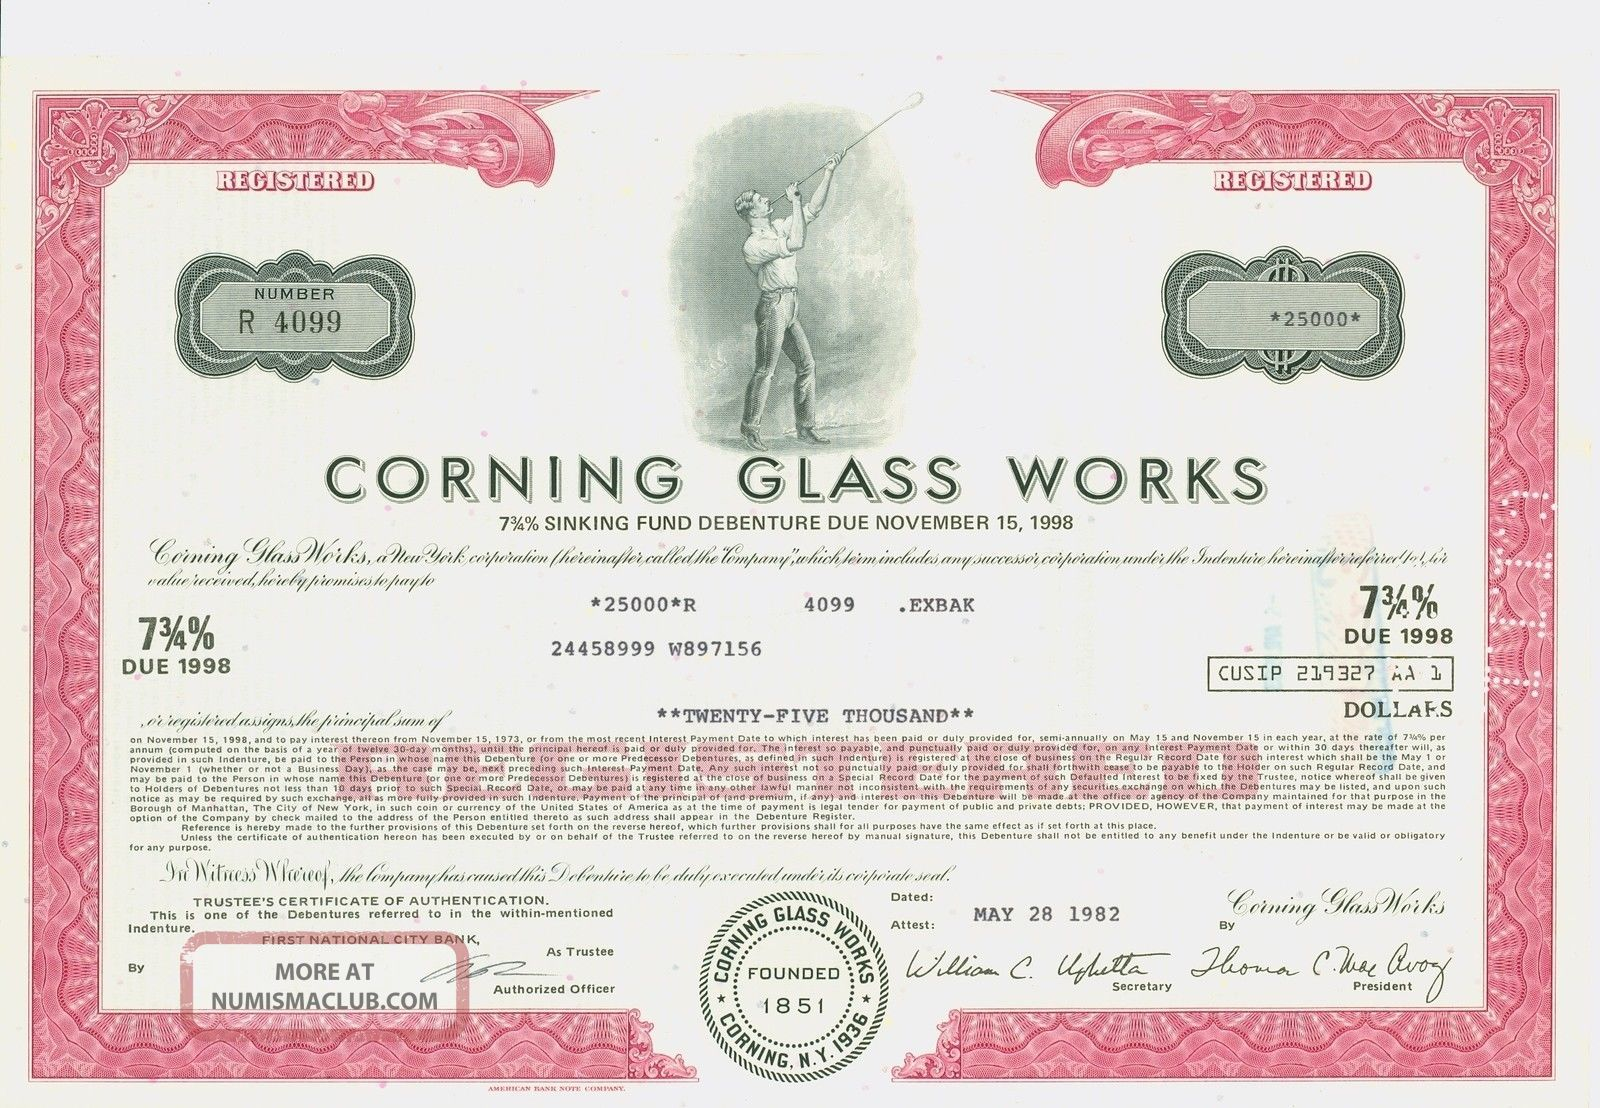 1973 Registered $25,  000 Bond Certificate Corning Glass Stocks & Bonds, Scripophily photo